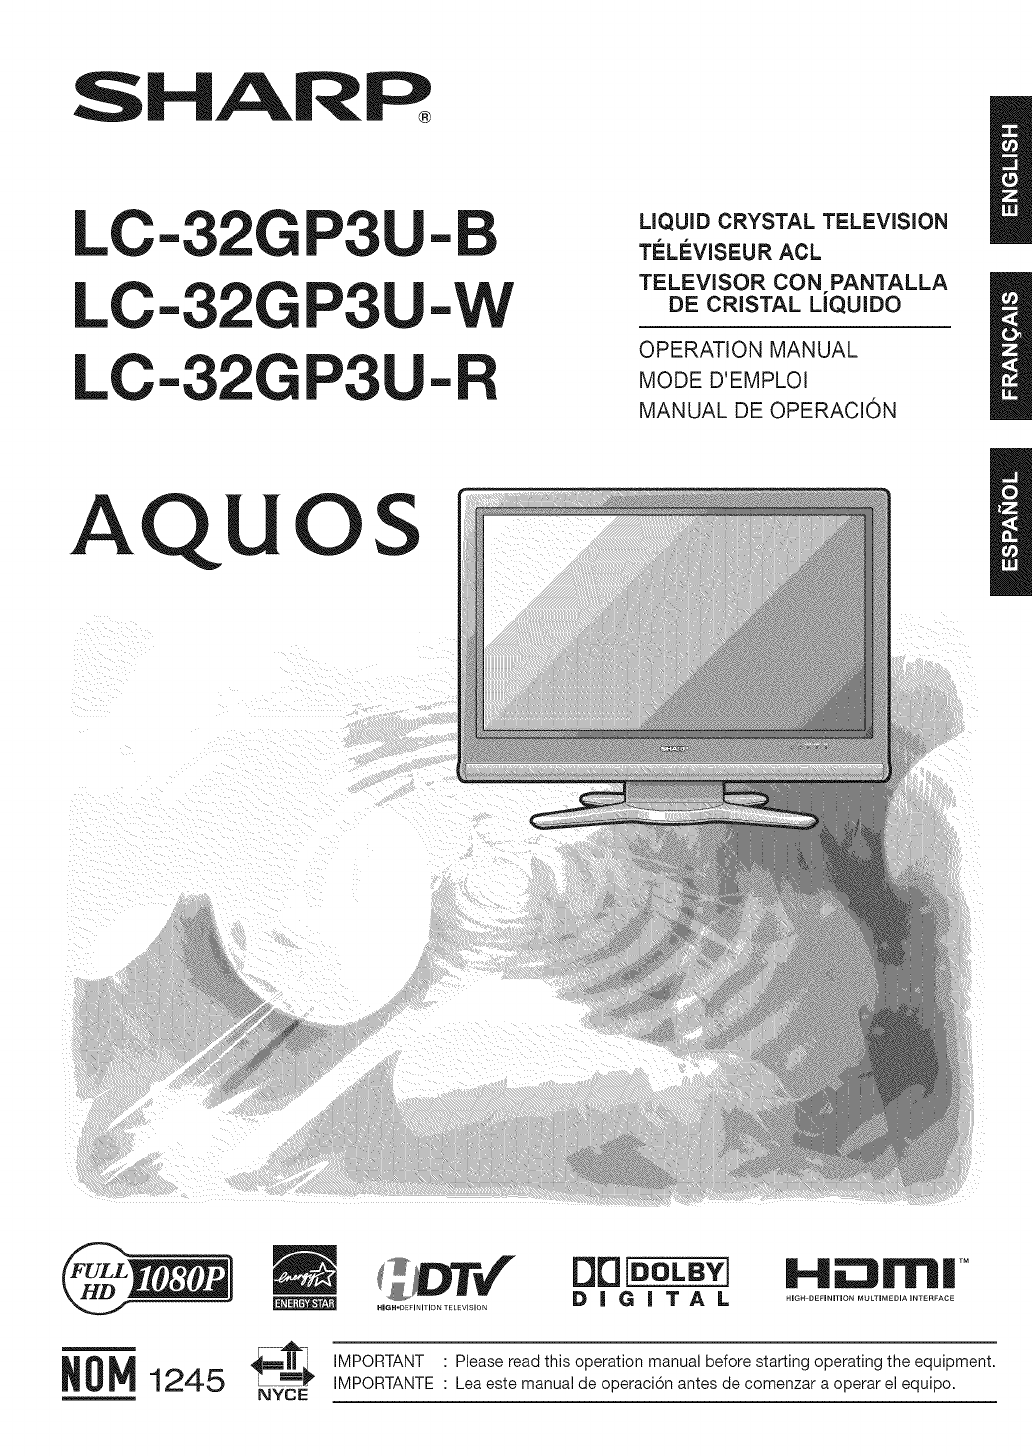 Sharp LC 32GP3UB User Manual LCD TELEVISION Manuals And